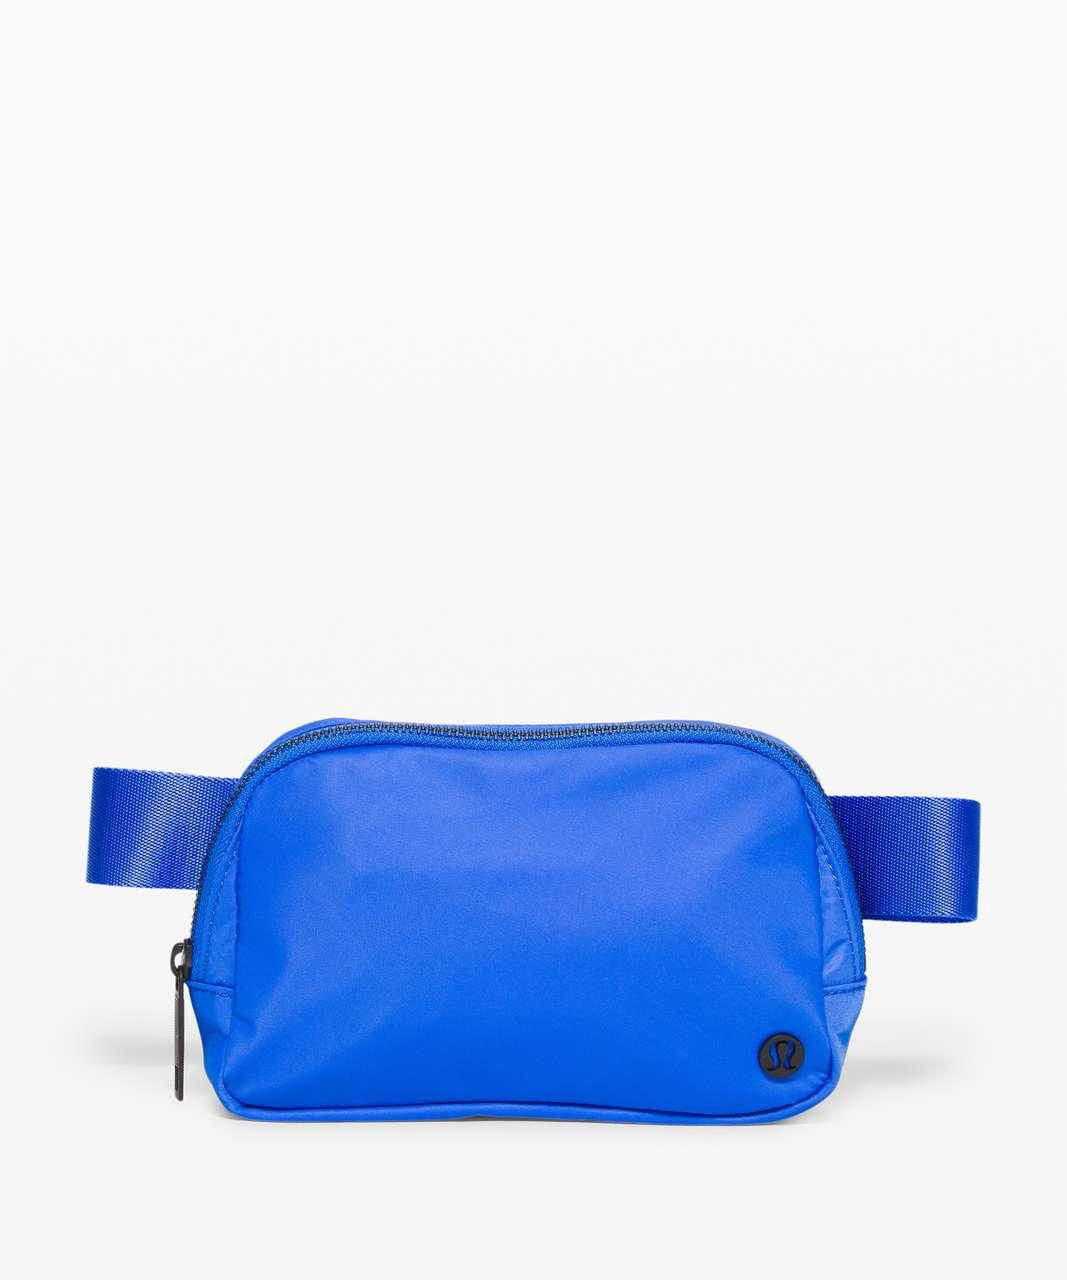 Lululemon Everywhere Belt Bag *1L - Wild Bluebell